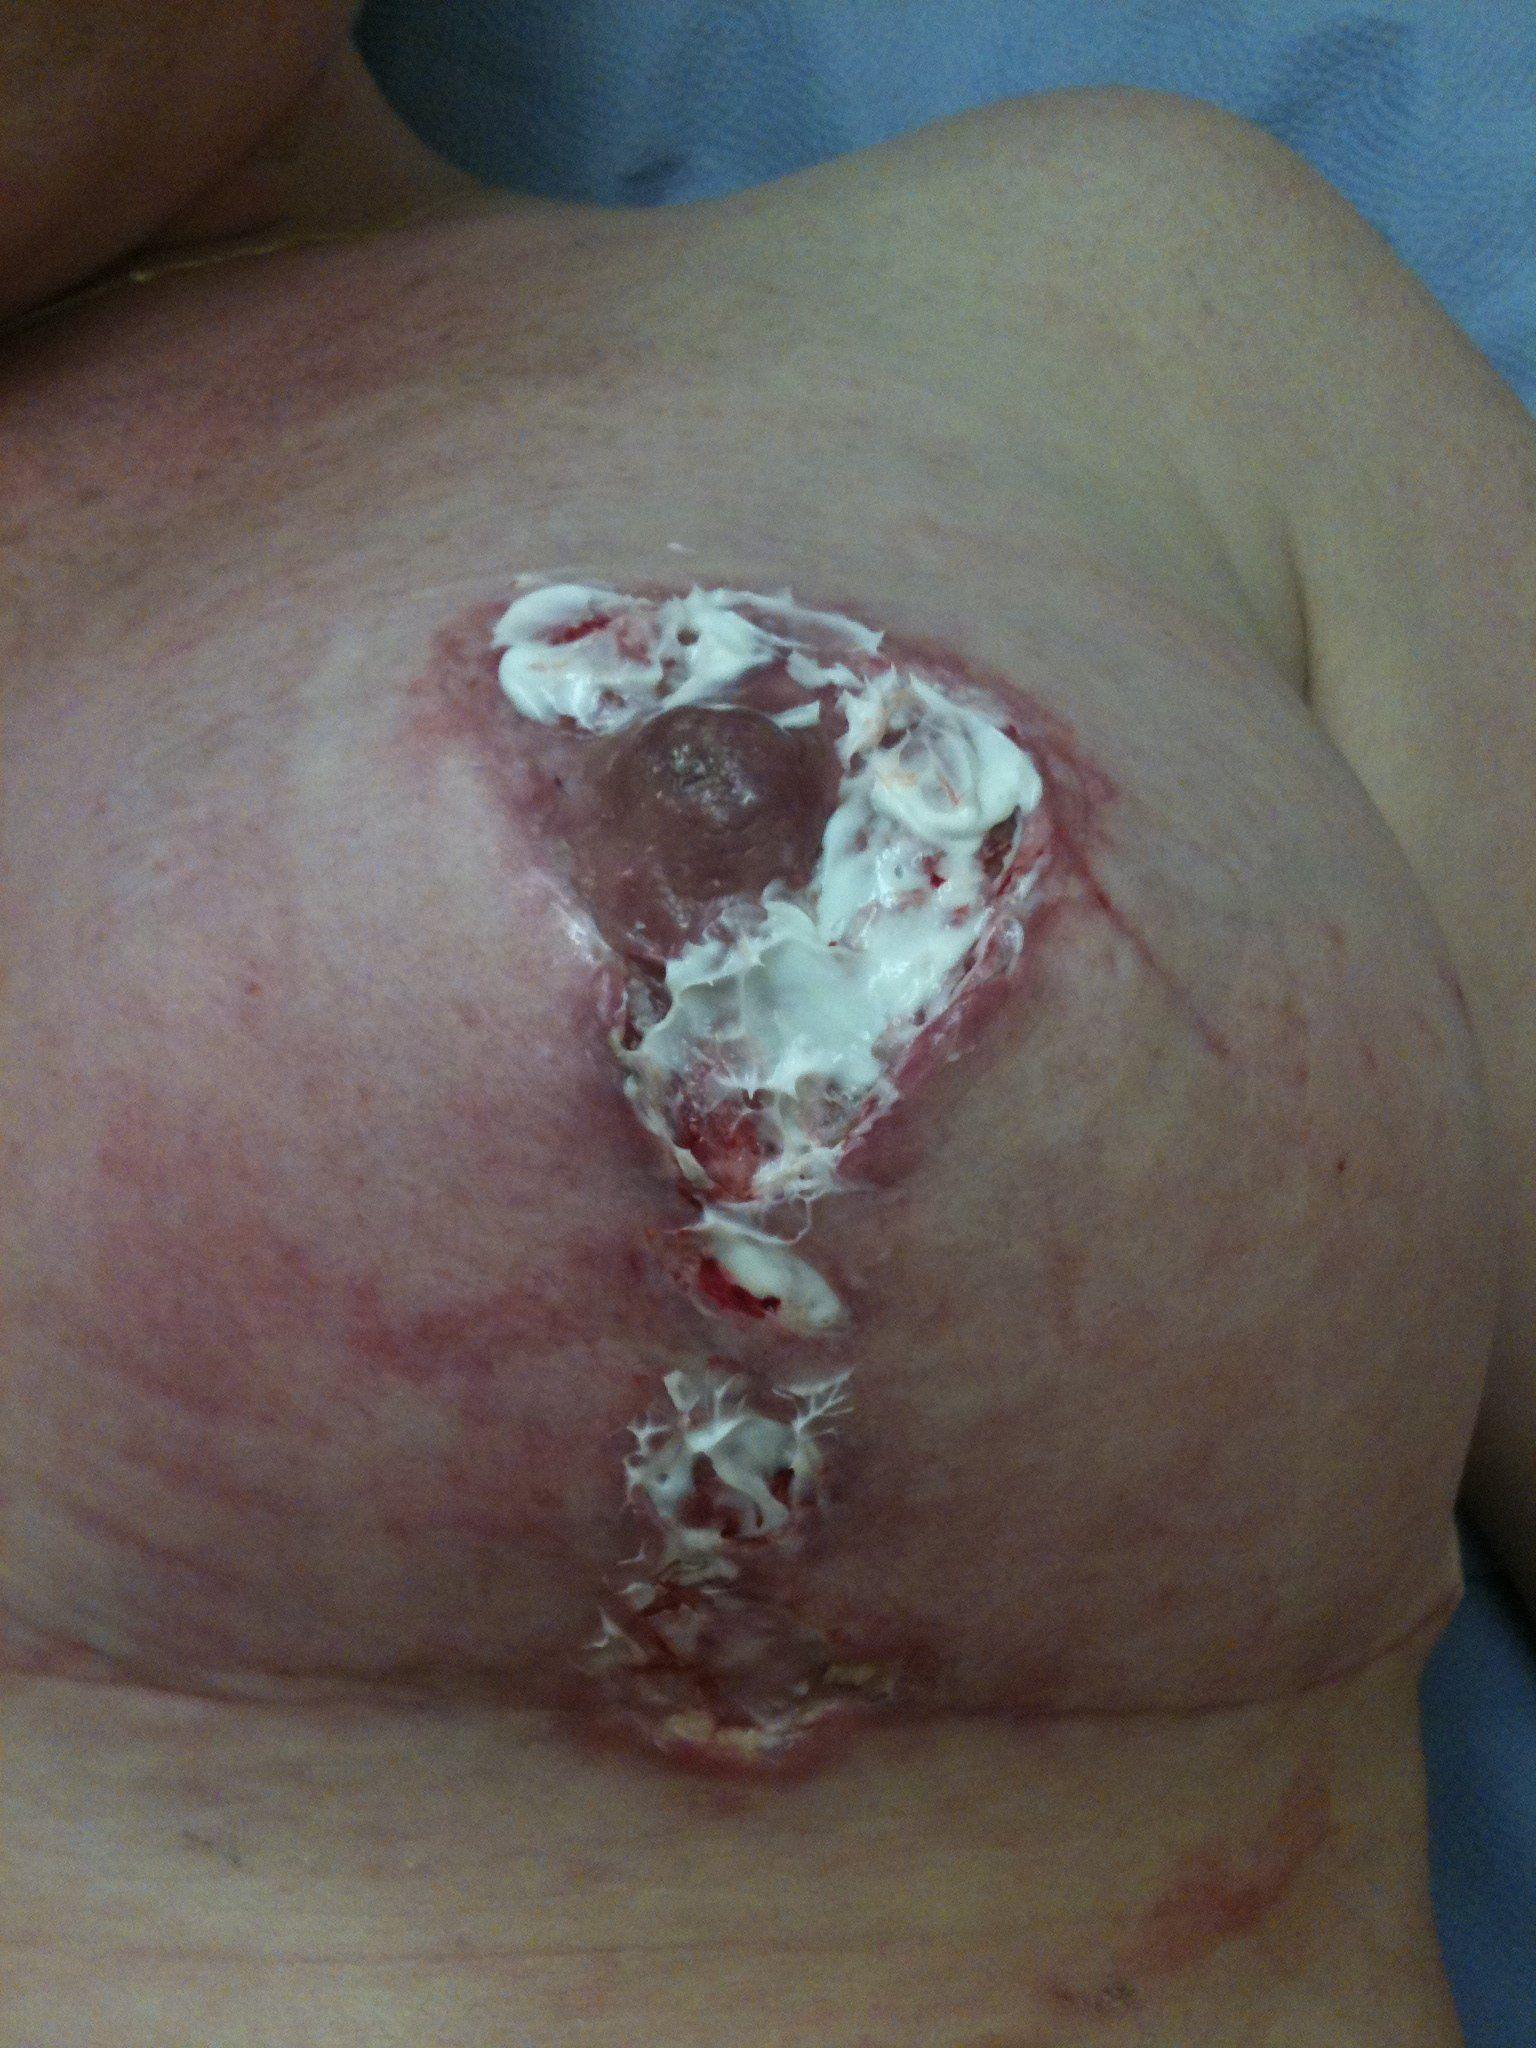 Kicks reccomend Breast lift complications picture